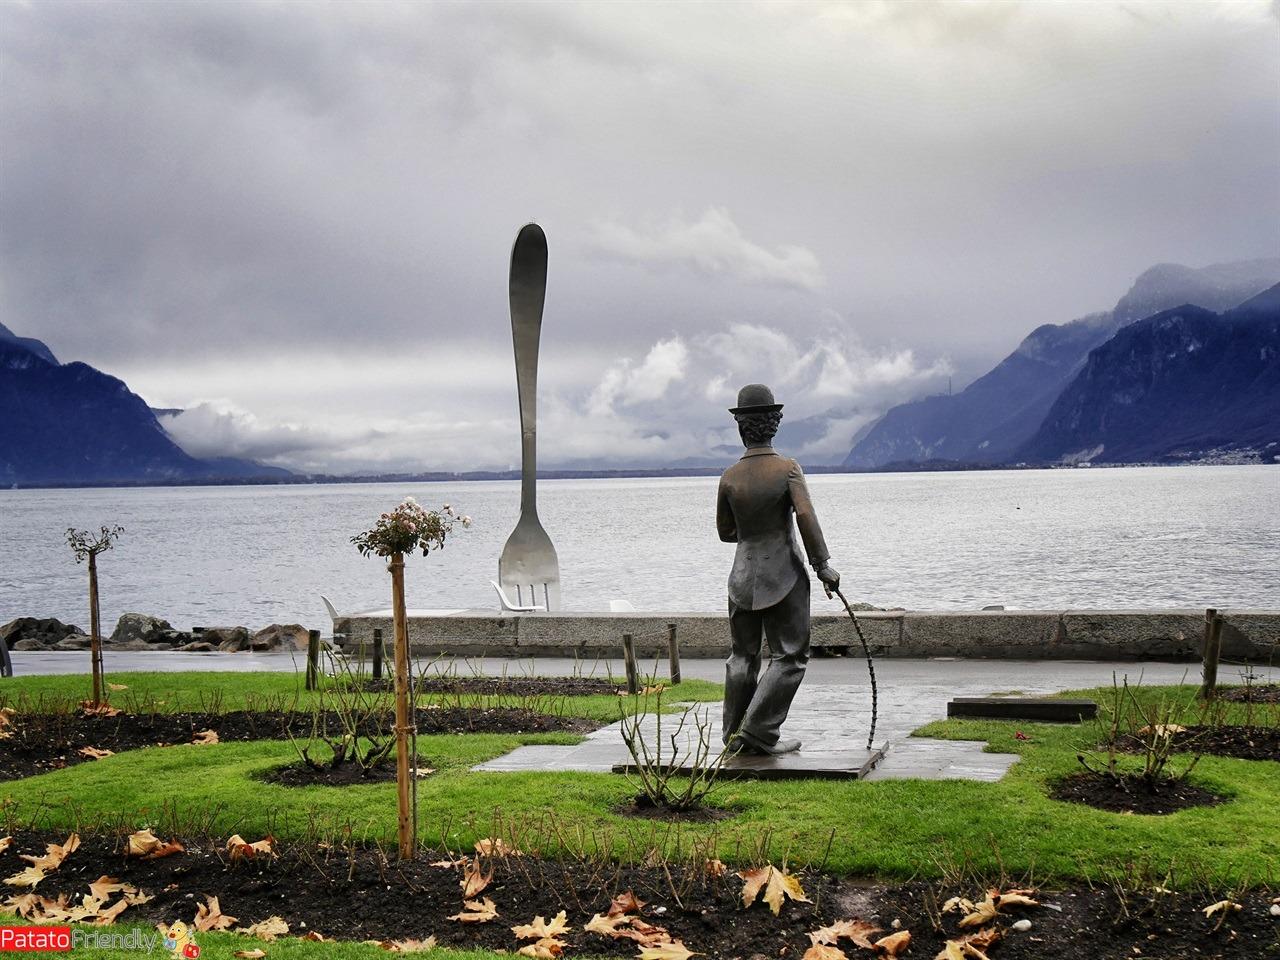 [cml_media_alt id='12975']Natale a Montreux coi bambini - Vevey e la statua di Charlie Chaplin[/cml_media_alt]